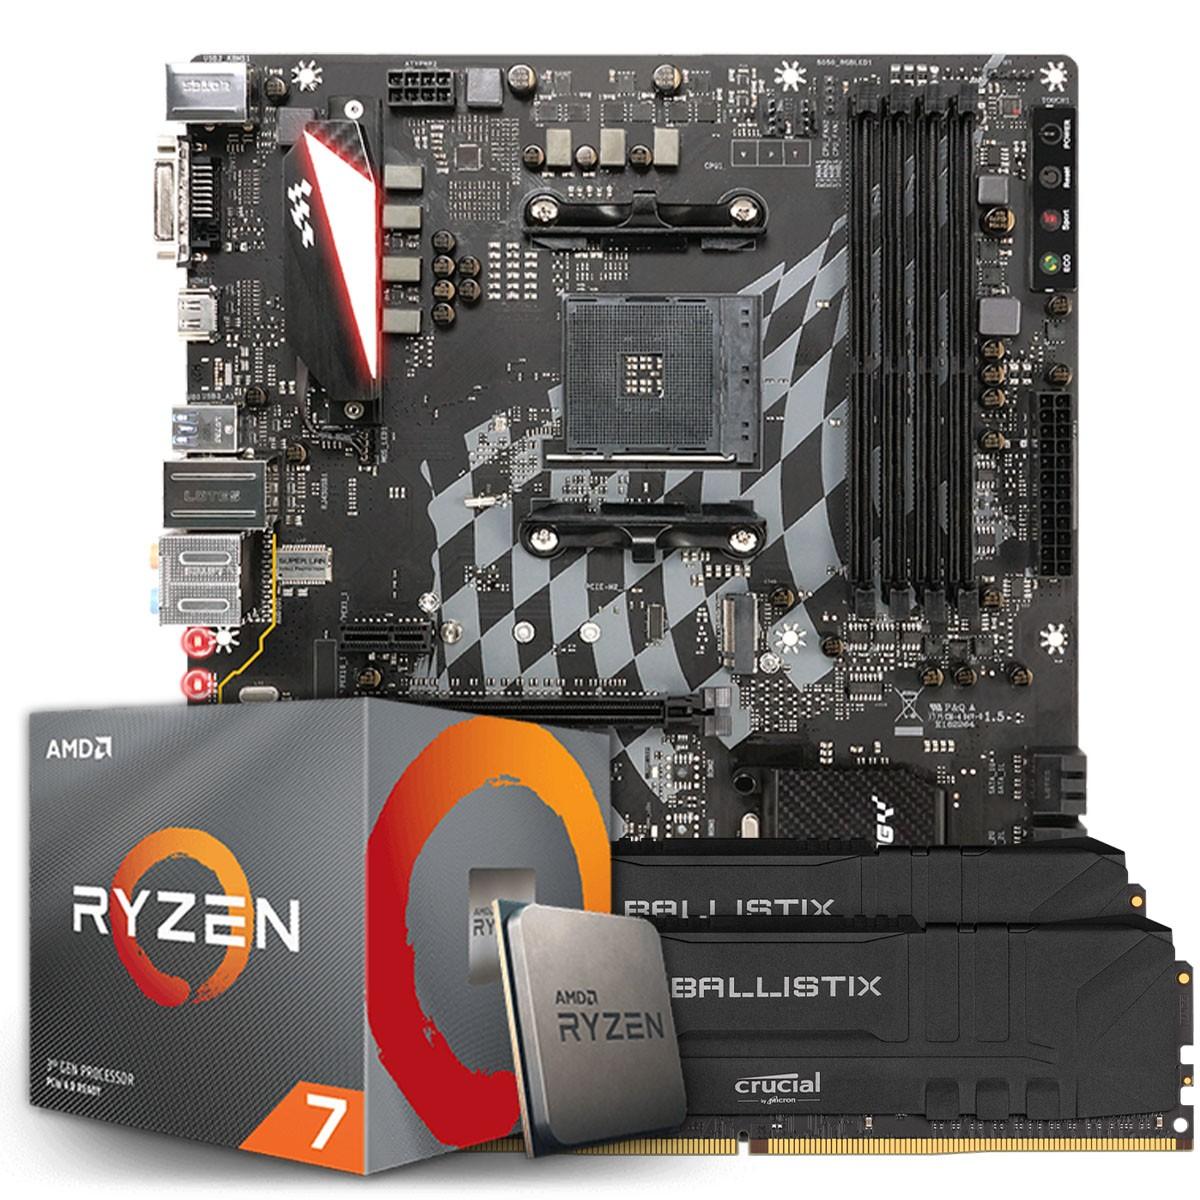 Kit Upgrade, AMD Ryzen 7 3700X, Biostar Racing X470GTA, Memória DDR4 16GB (2X8GB) 3000MHz